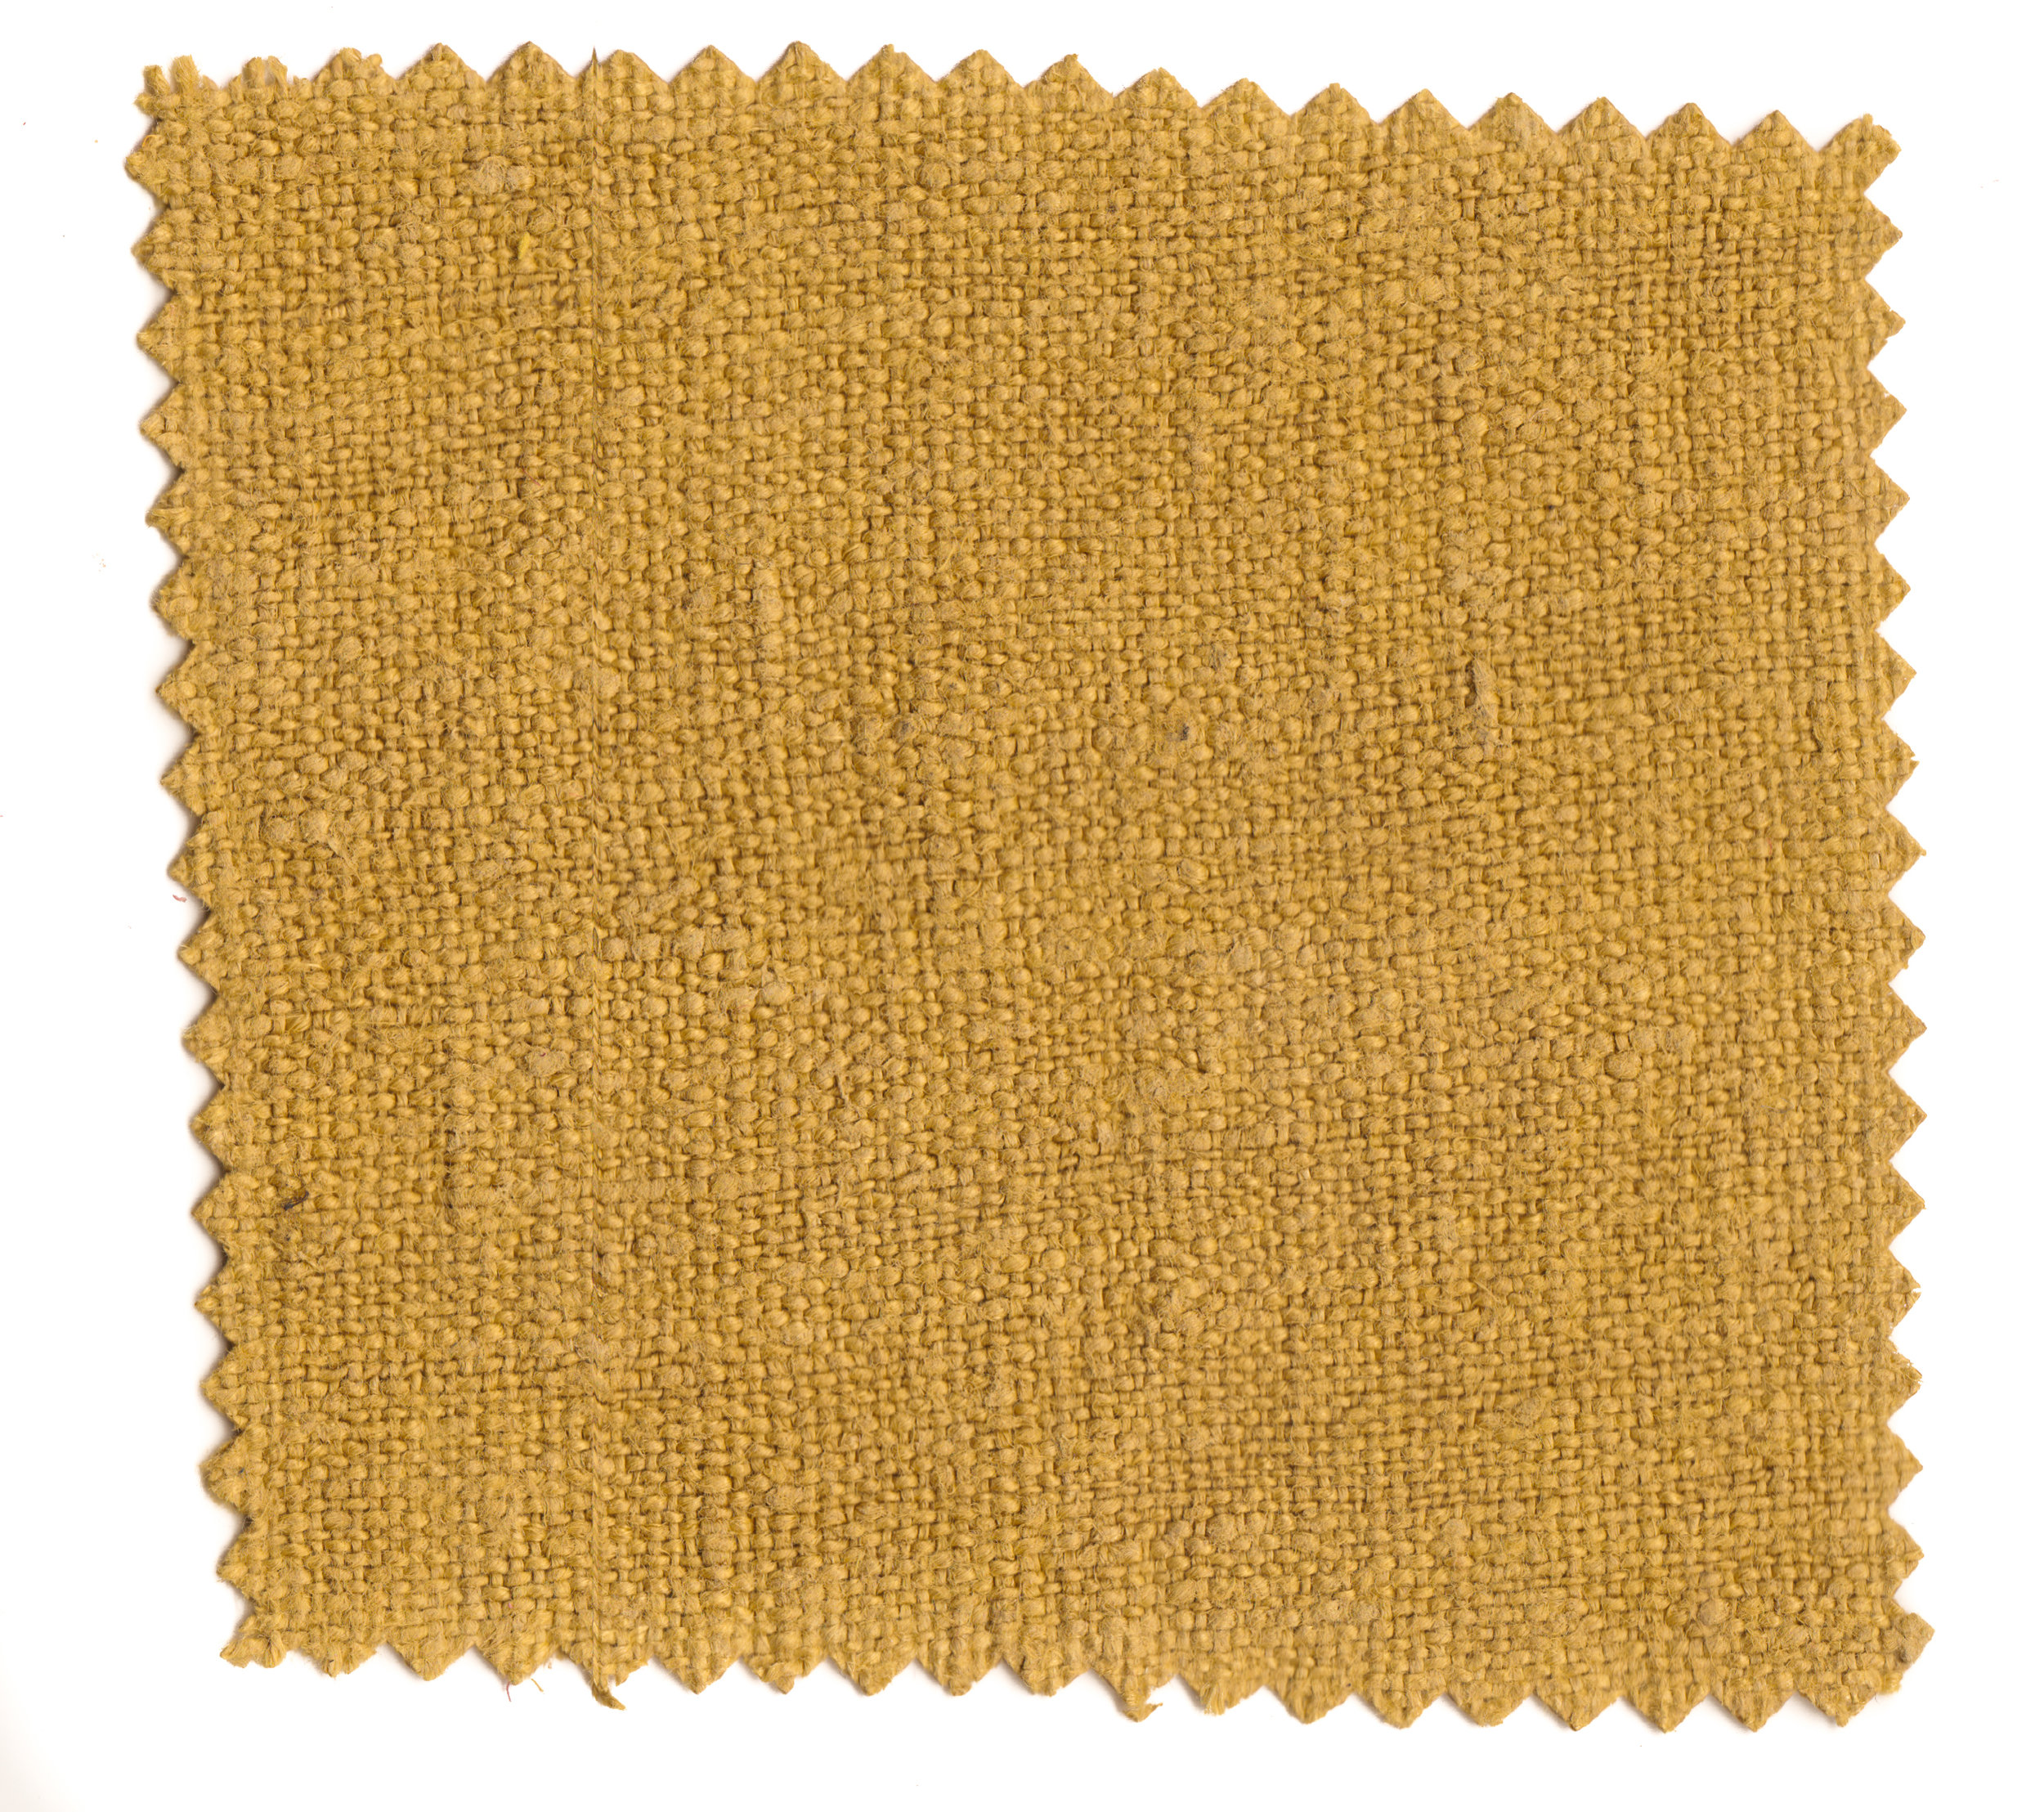 Straw Yellows-4.jpg